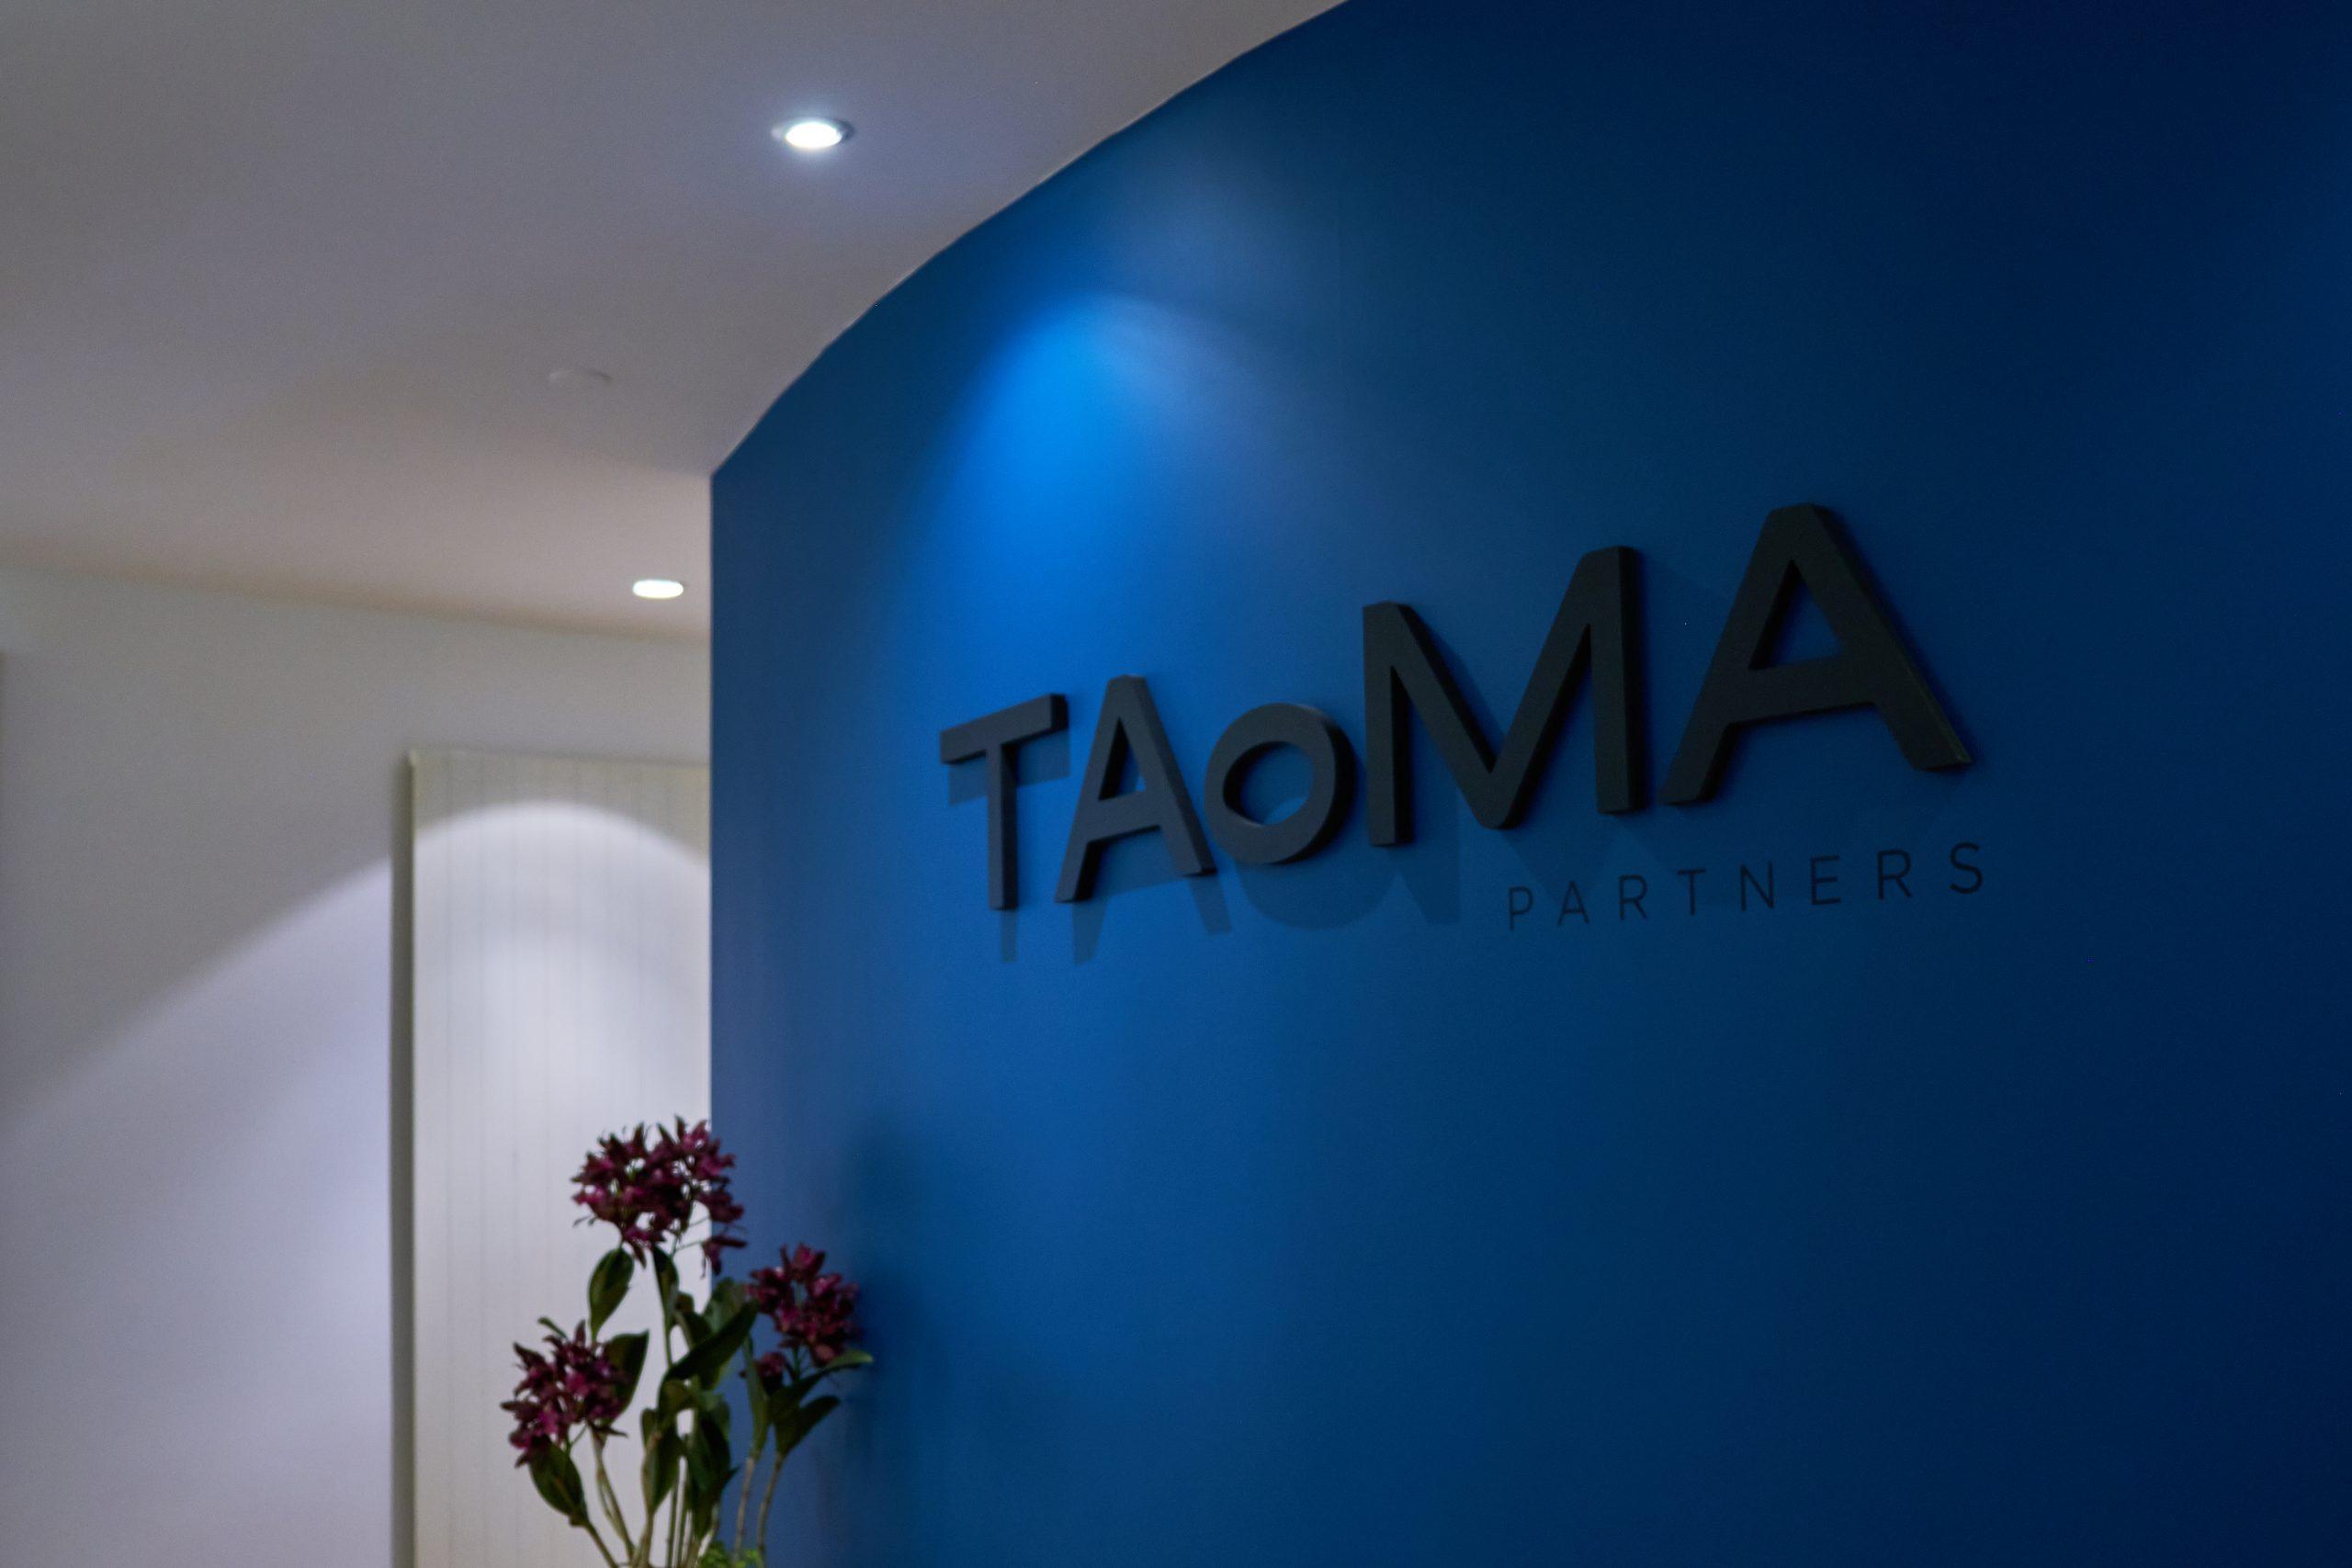 Taoma Partners